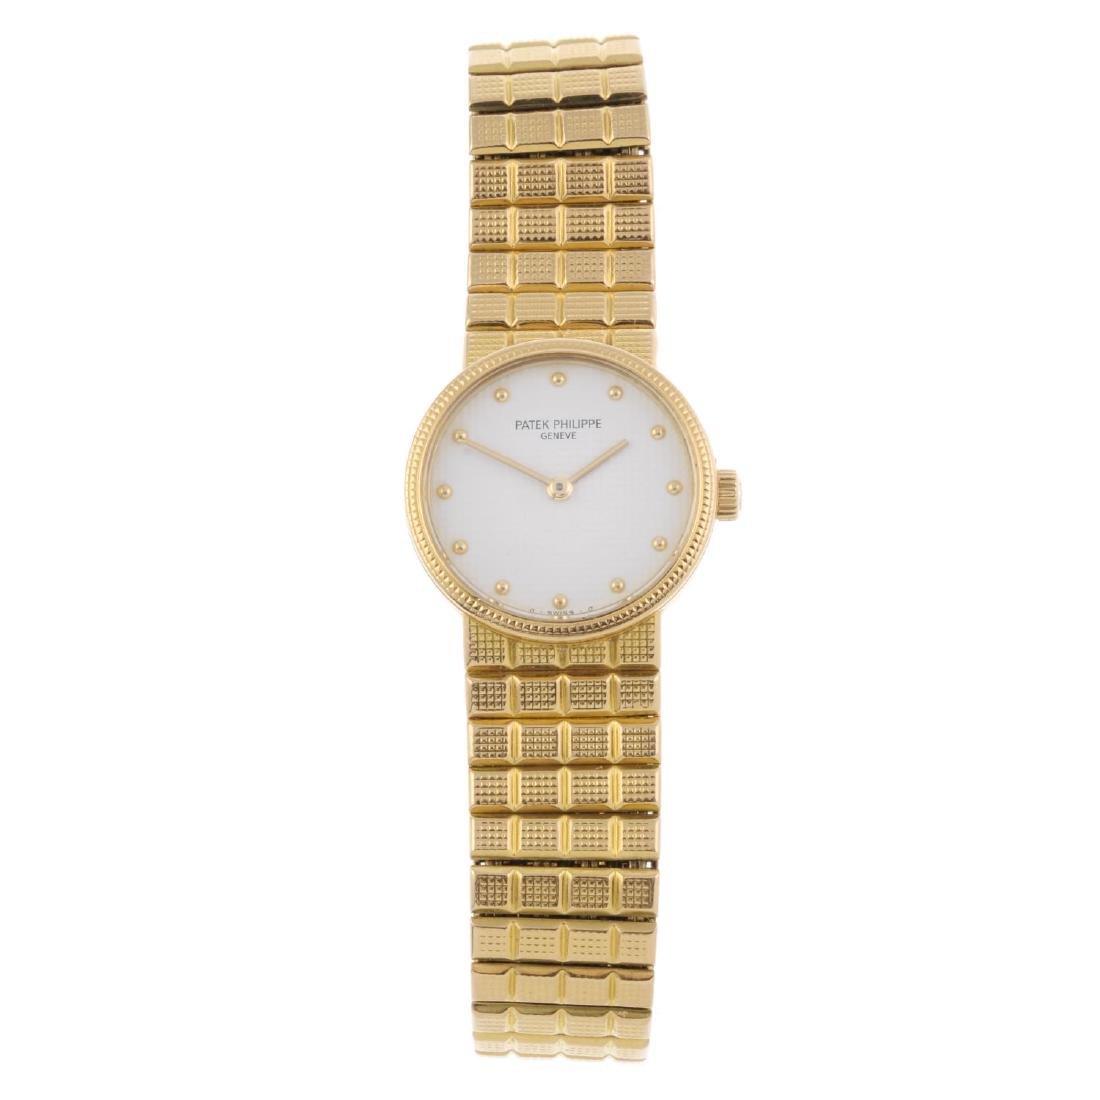 PATEK PHILIPPE - a lady's Calatrava bracelet watch.